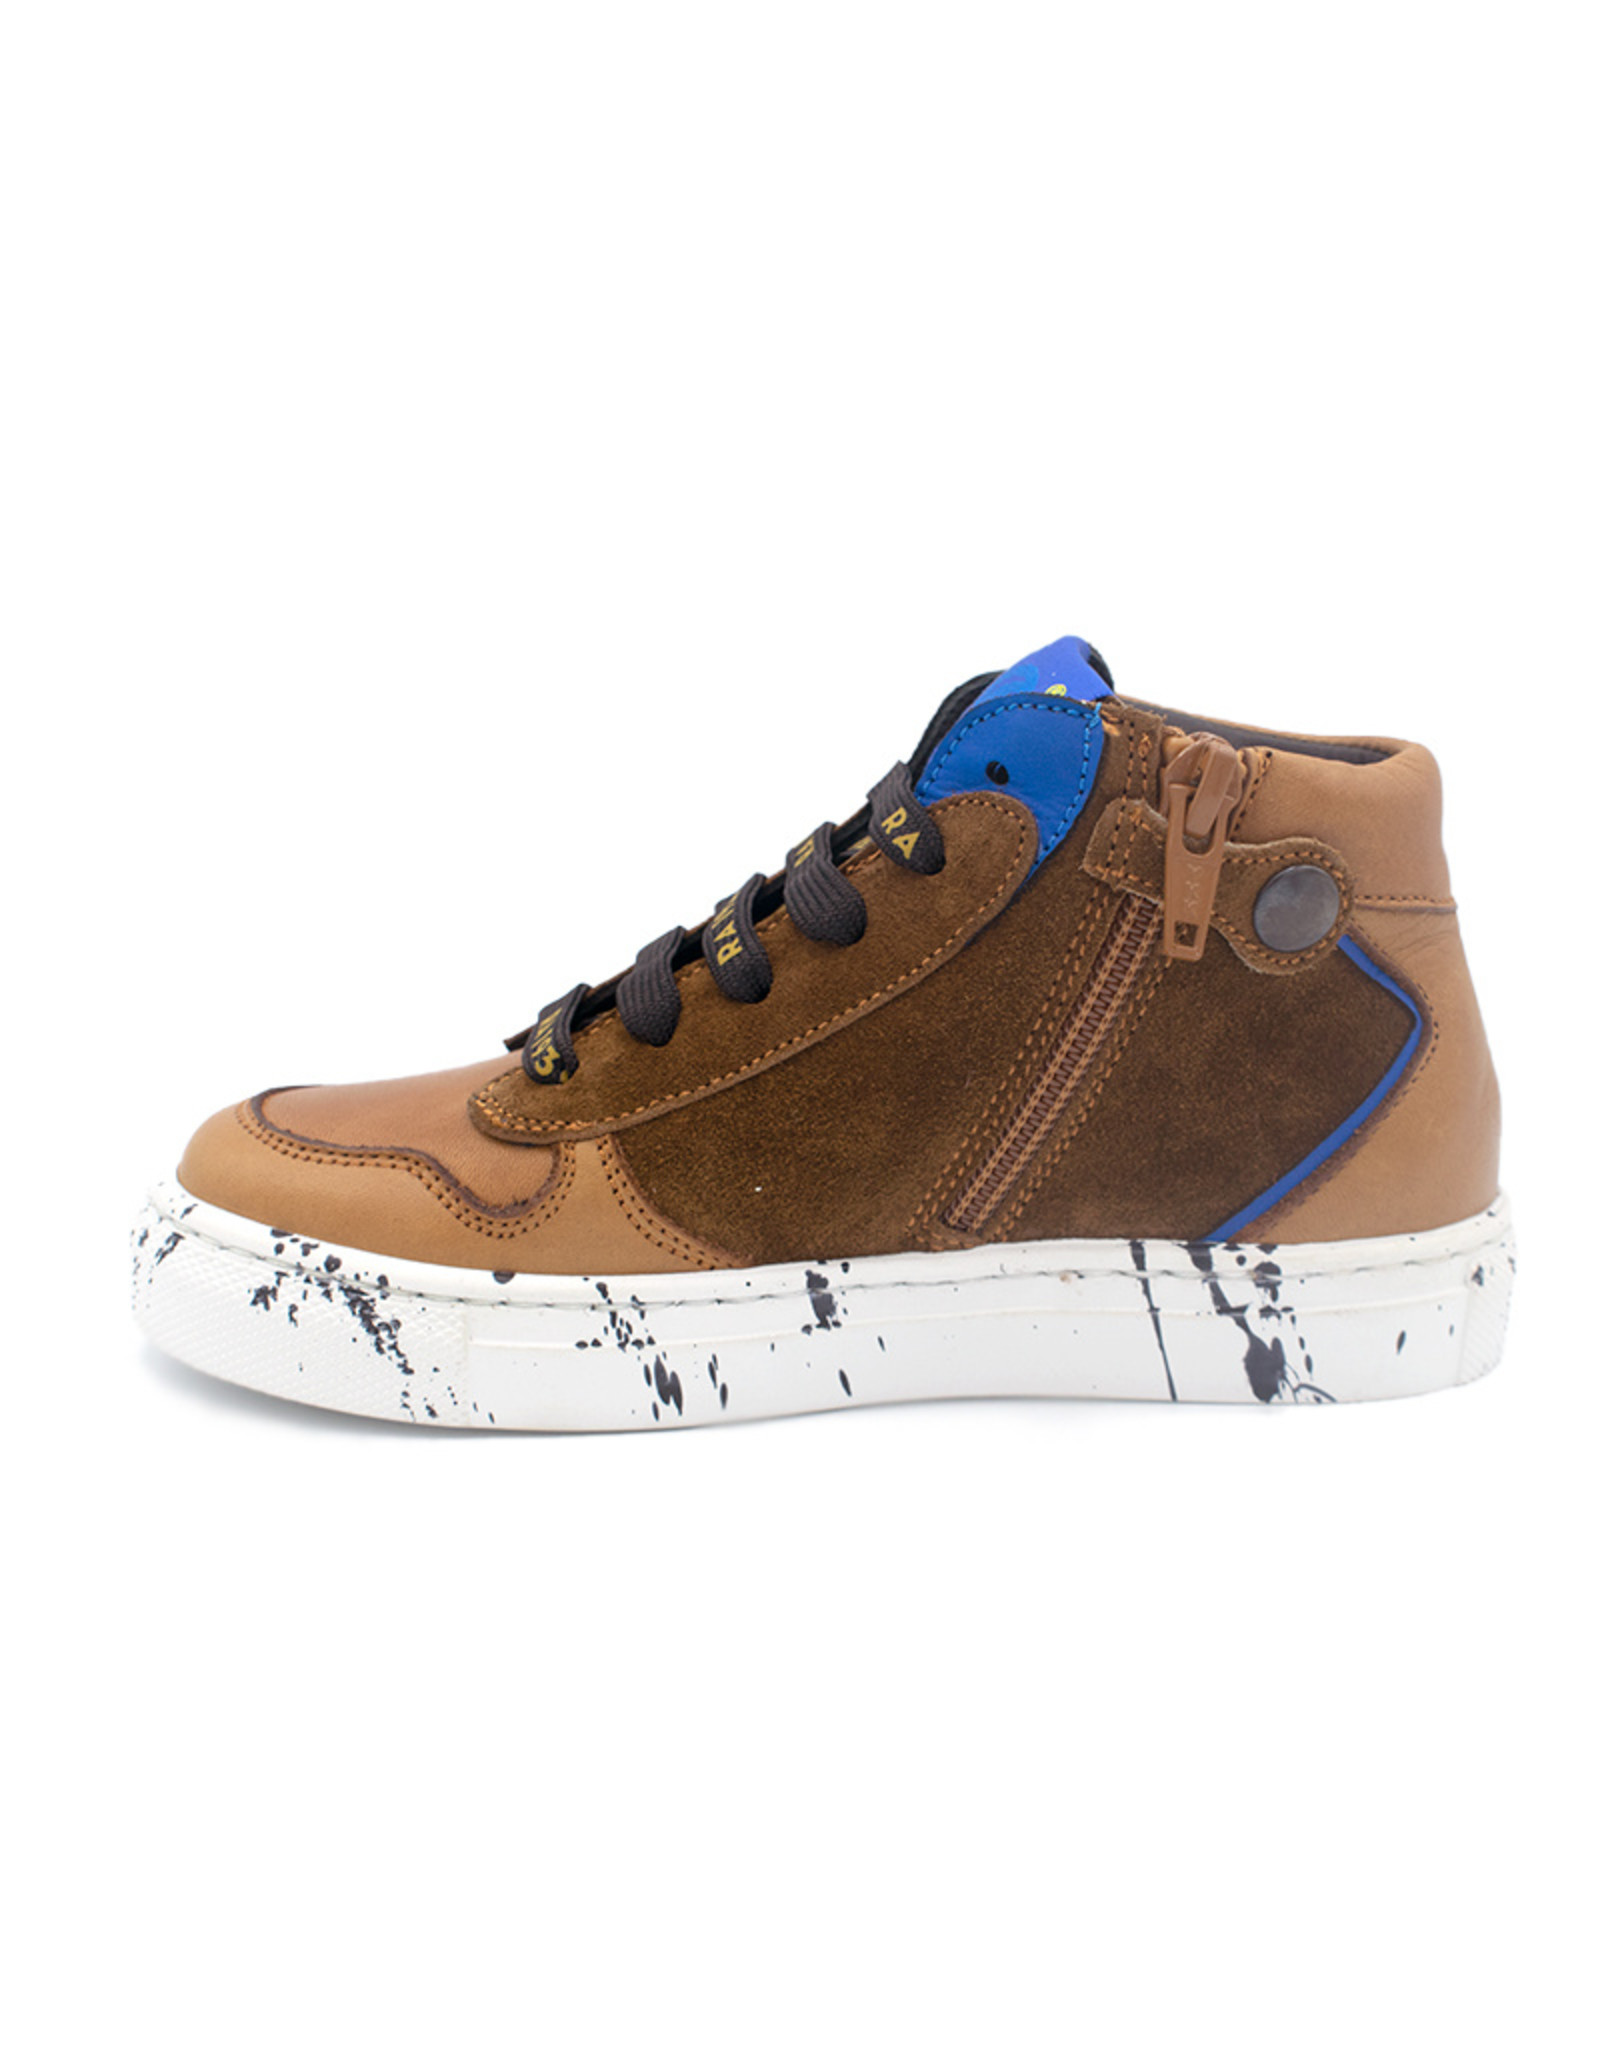 RONDINELLA RONDINELLA sneaker camel spikkelzool